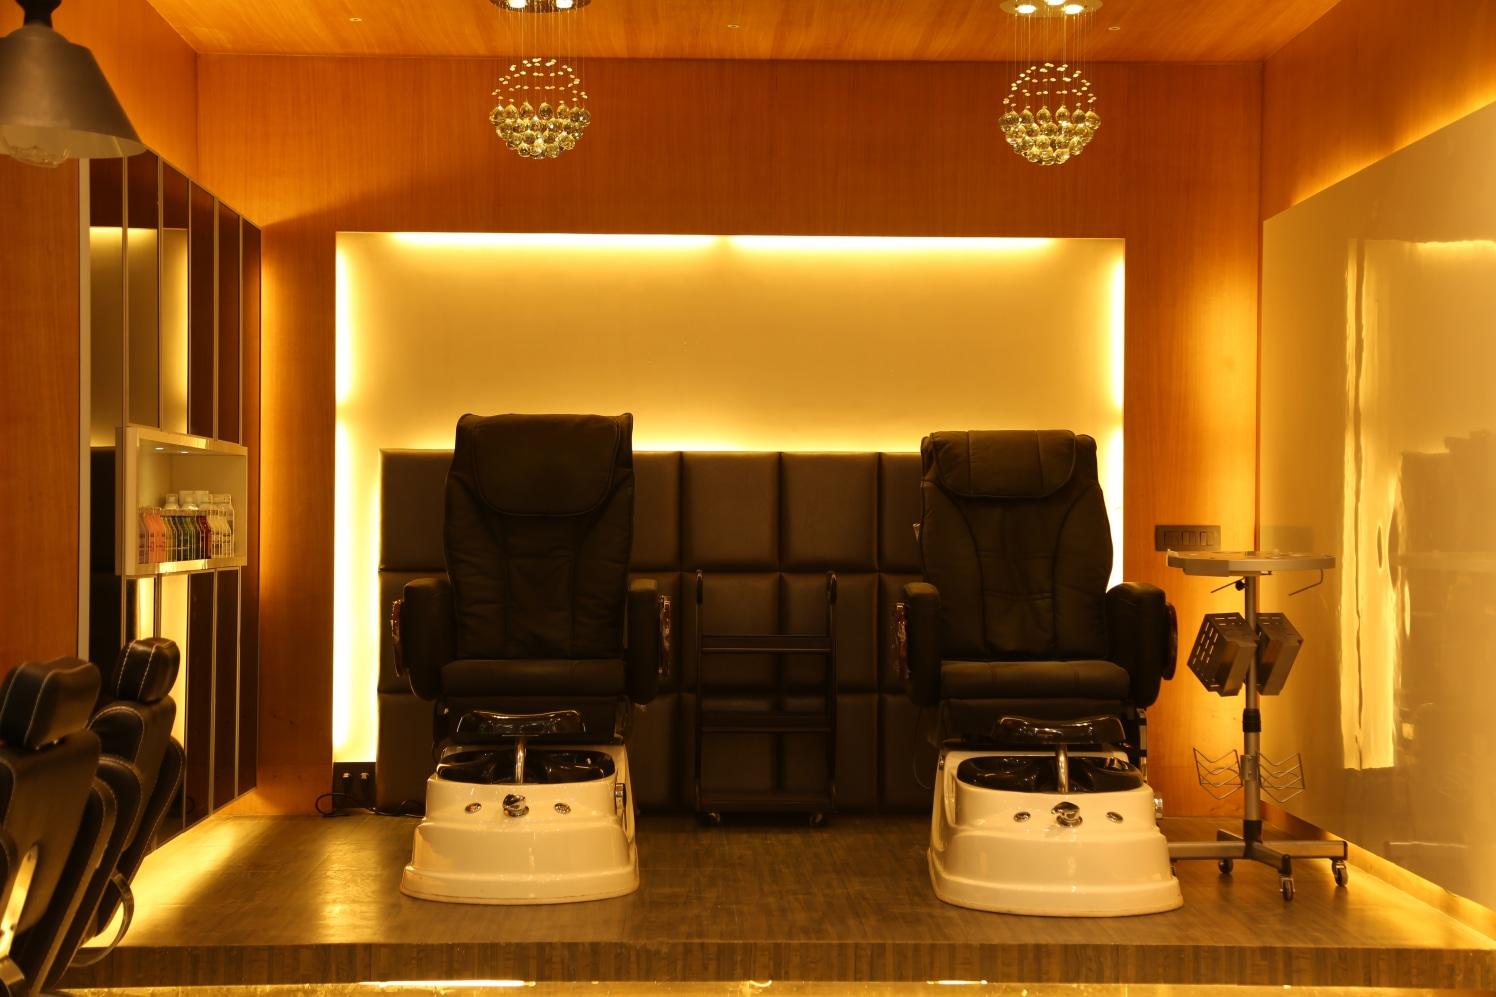 Wash Them Hair! by Vinod Kalburgi Modern | Interior Design Photos & Ideas